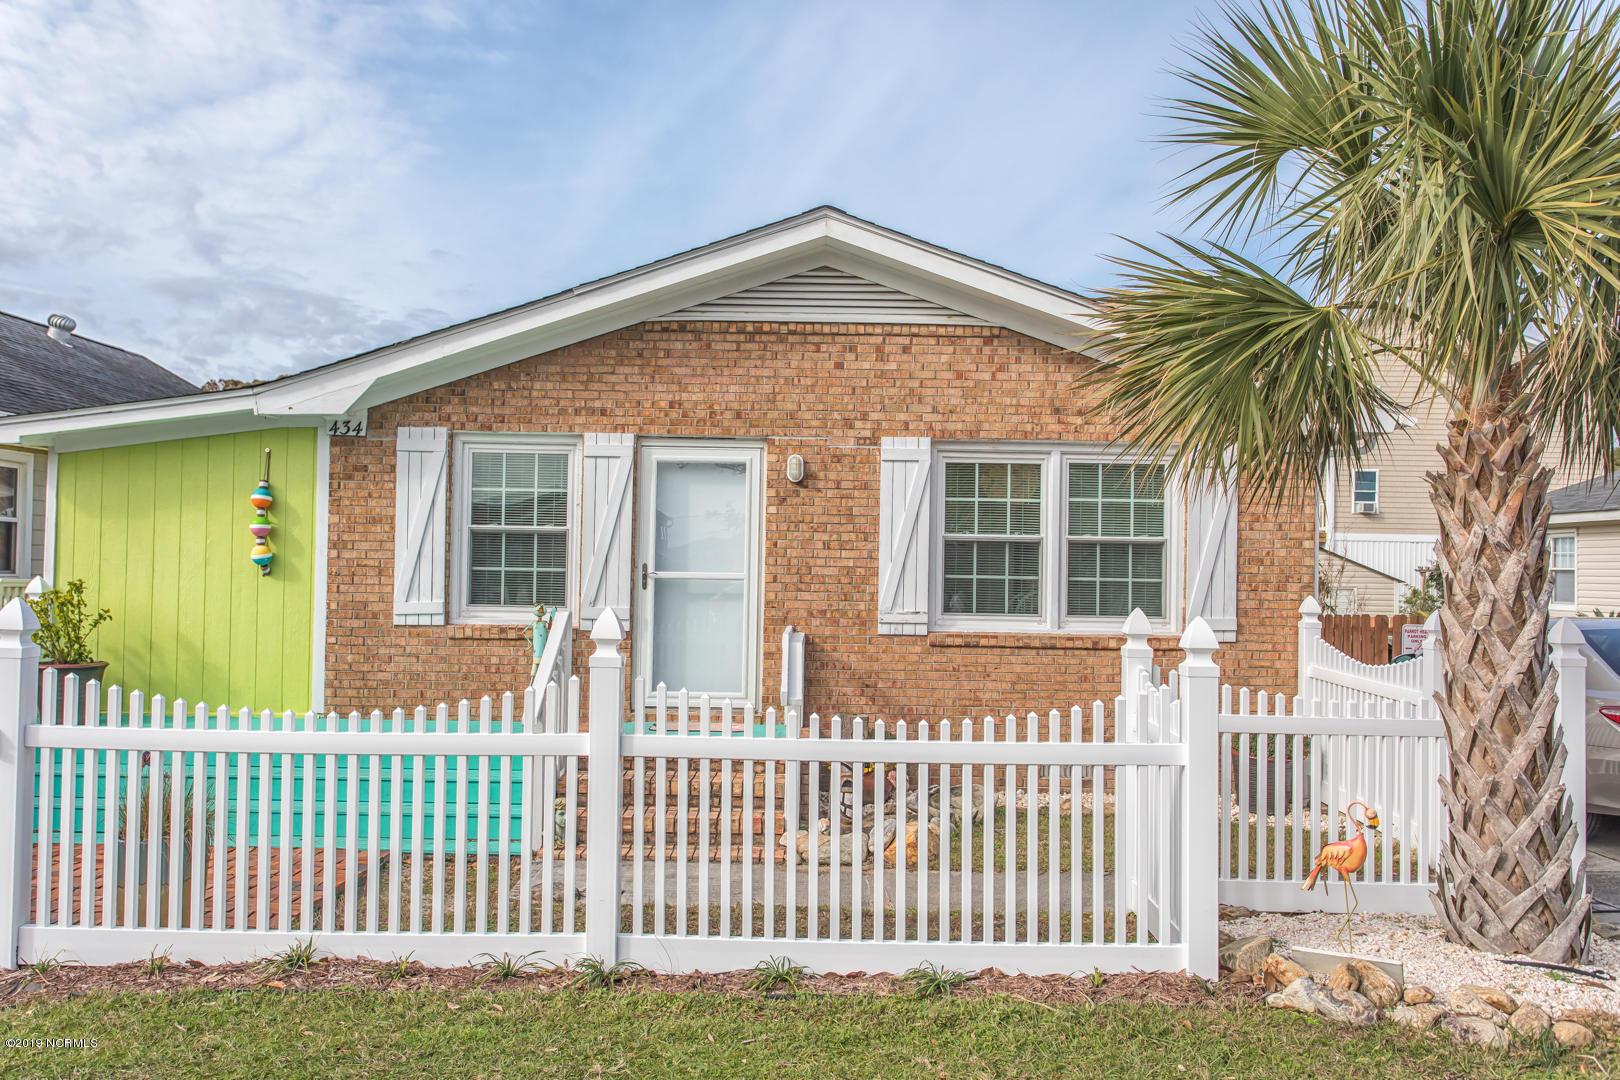 Carolina Plantations Real Estate - MLS Number: 100144359